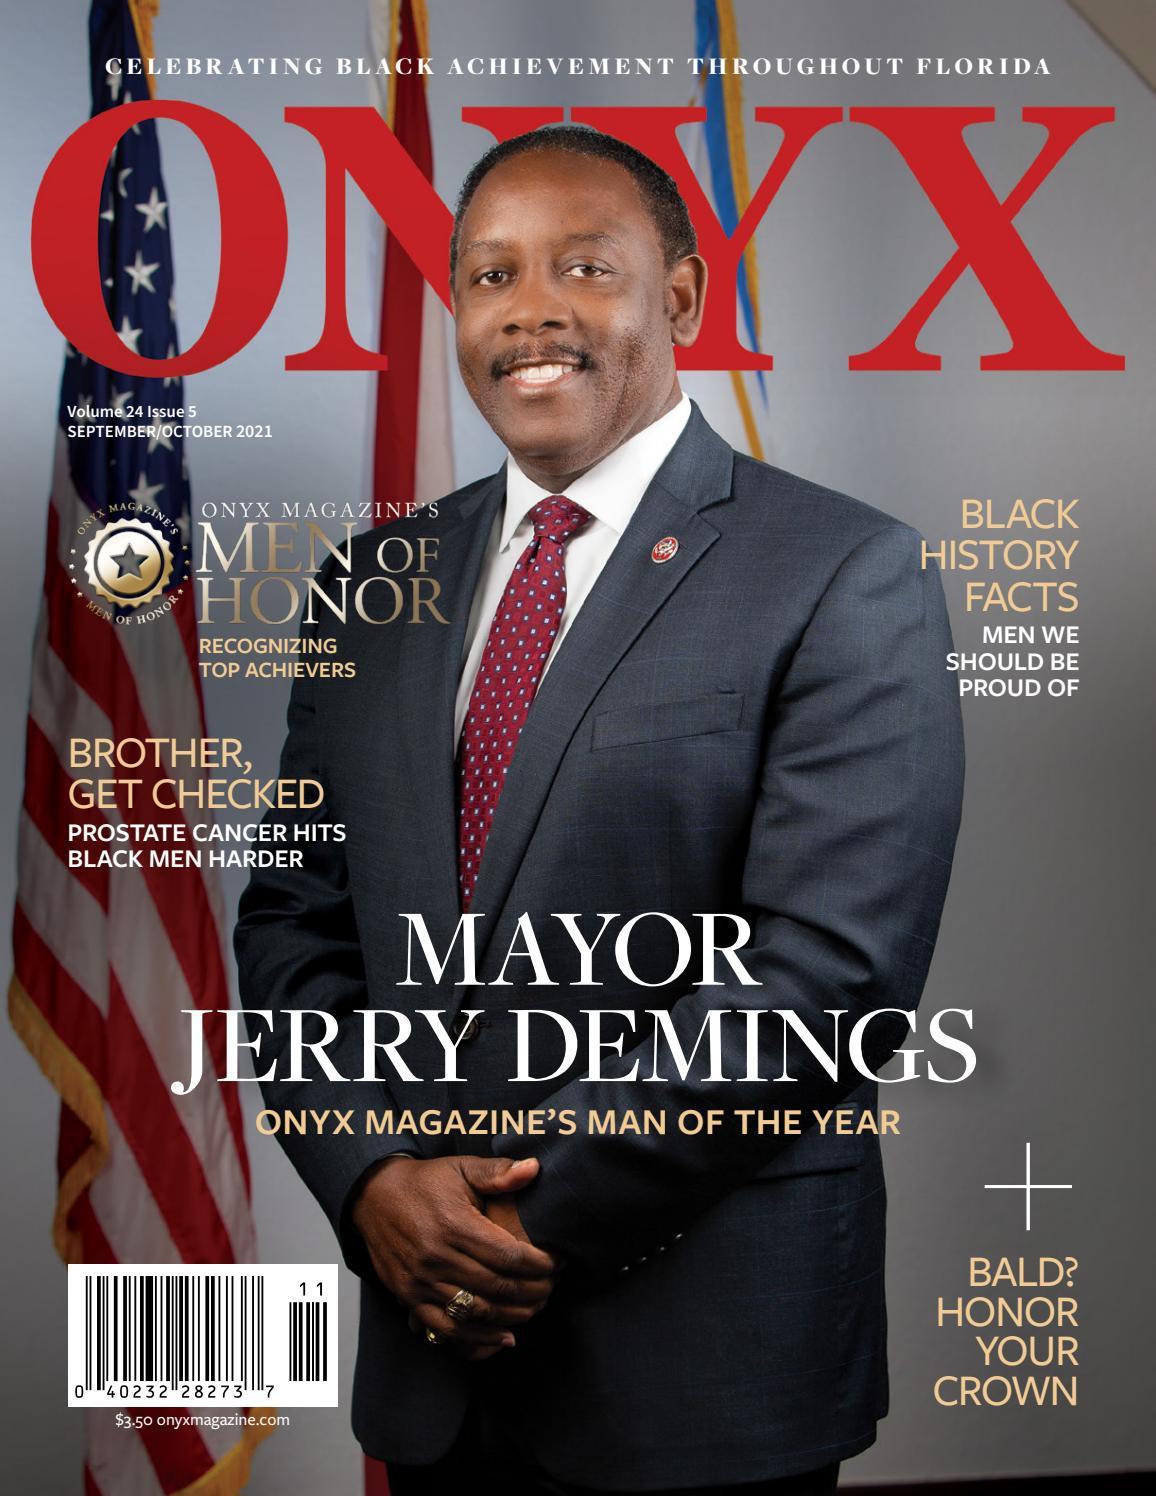 ONYX Magazine September/October 2021